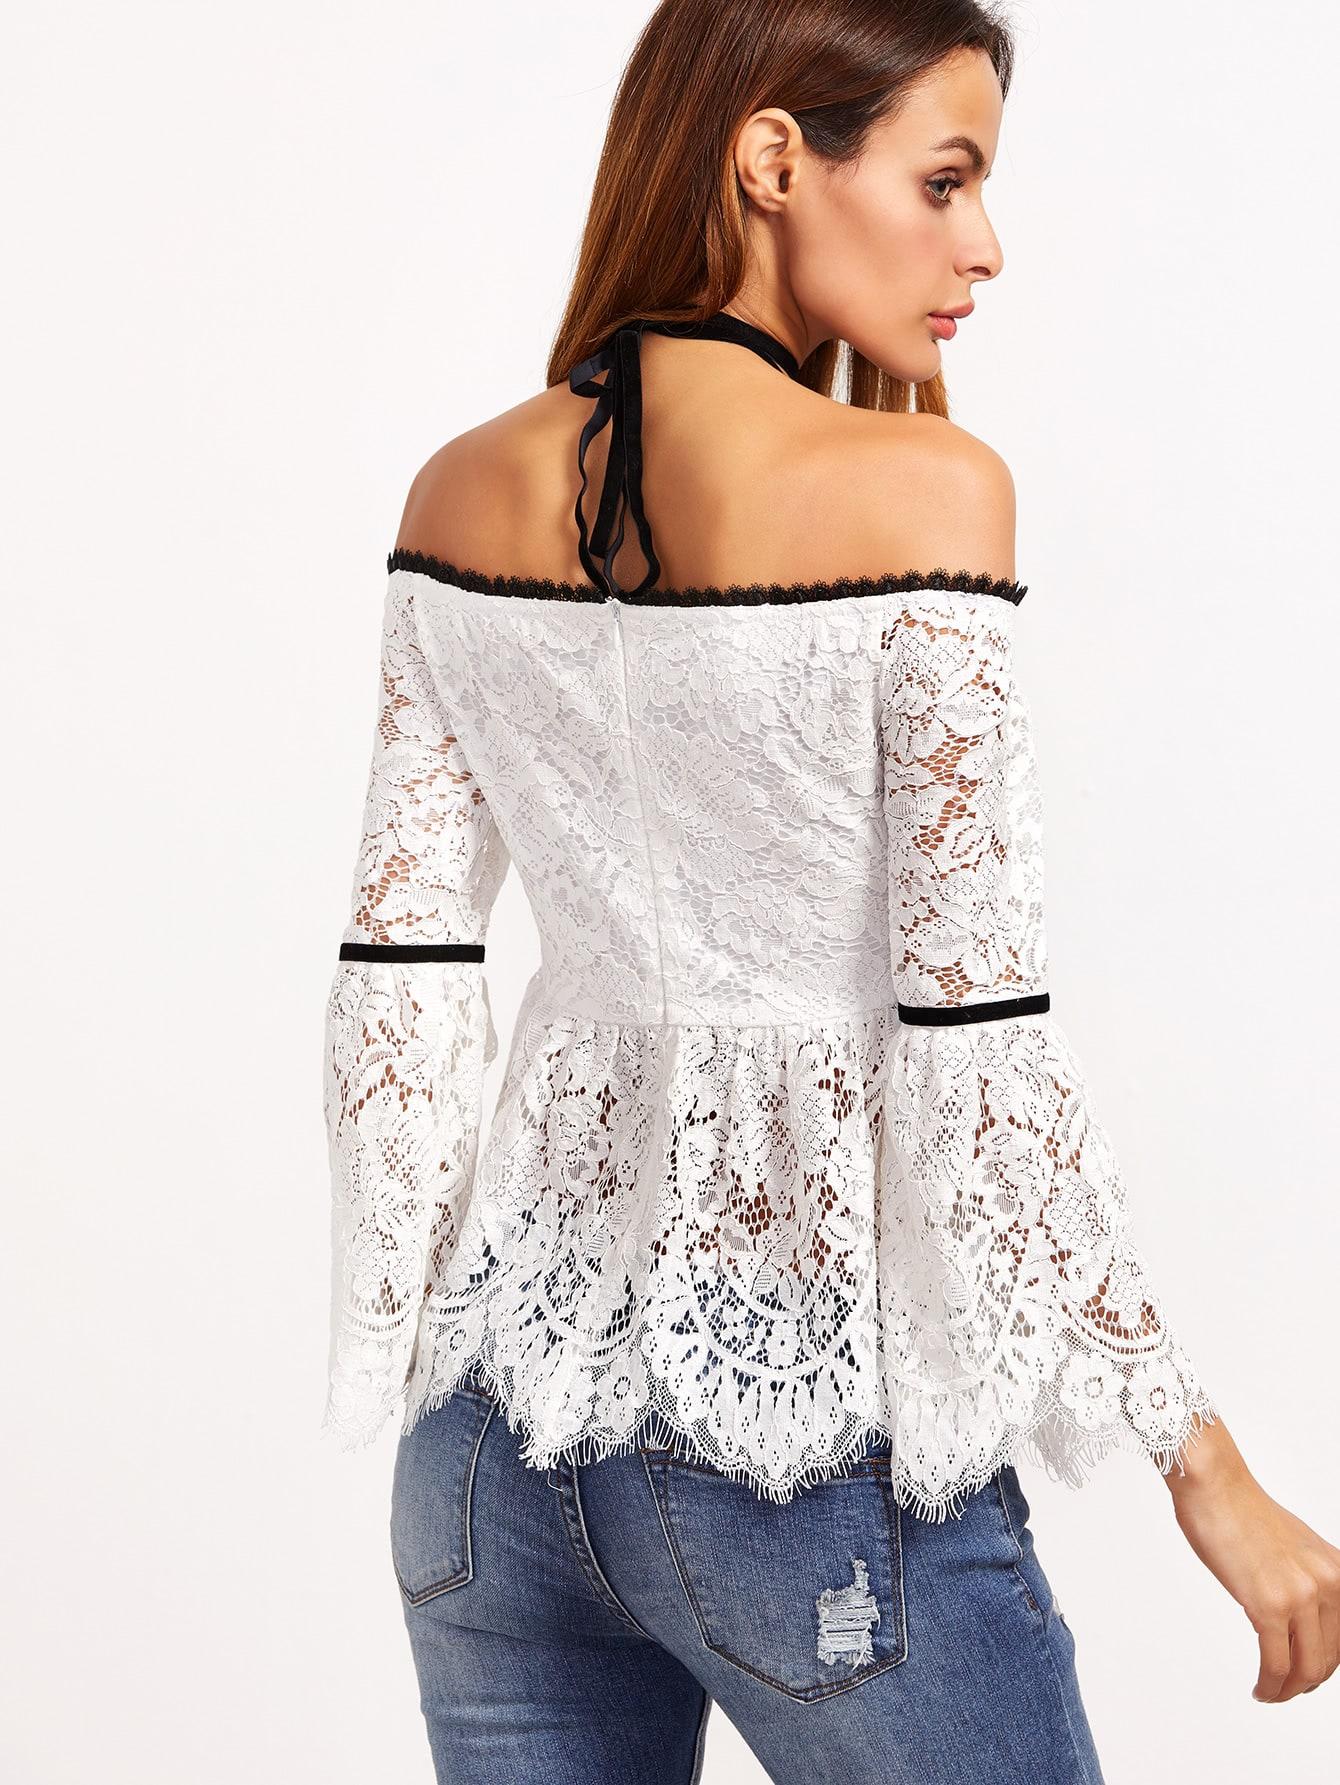 blouse161123702_2